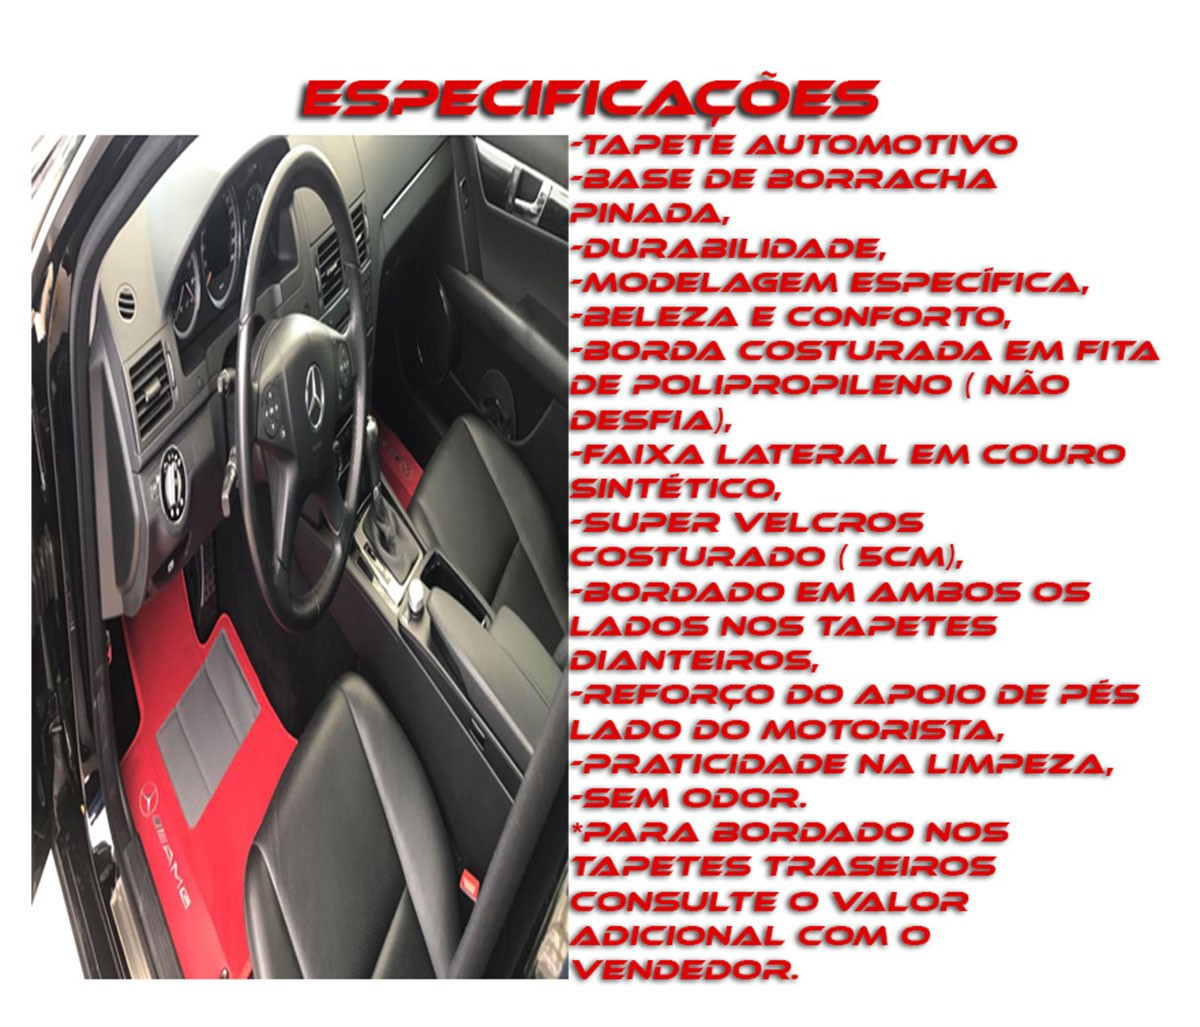 Tapete Mitsubishi Pajero Full 3portas Borracha Pvc Base Pina